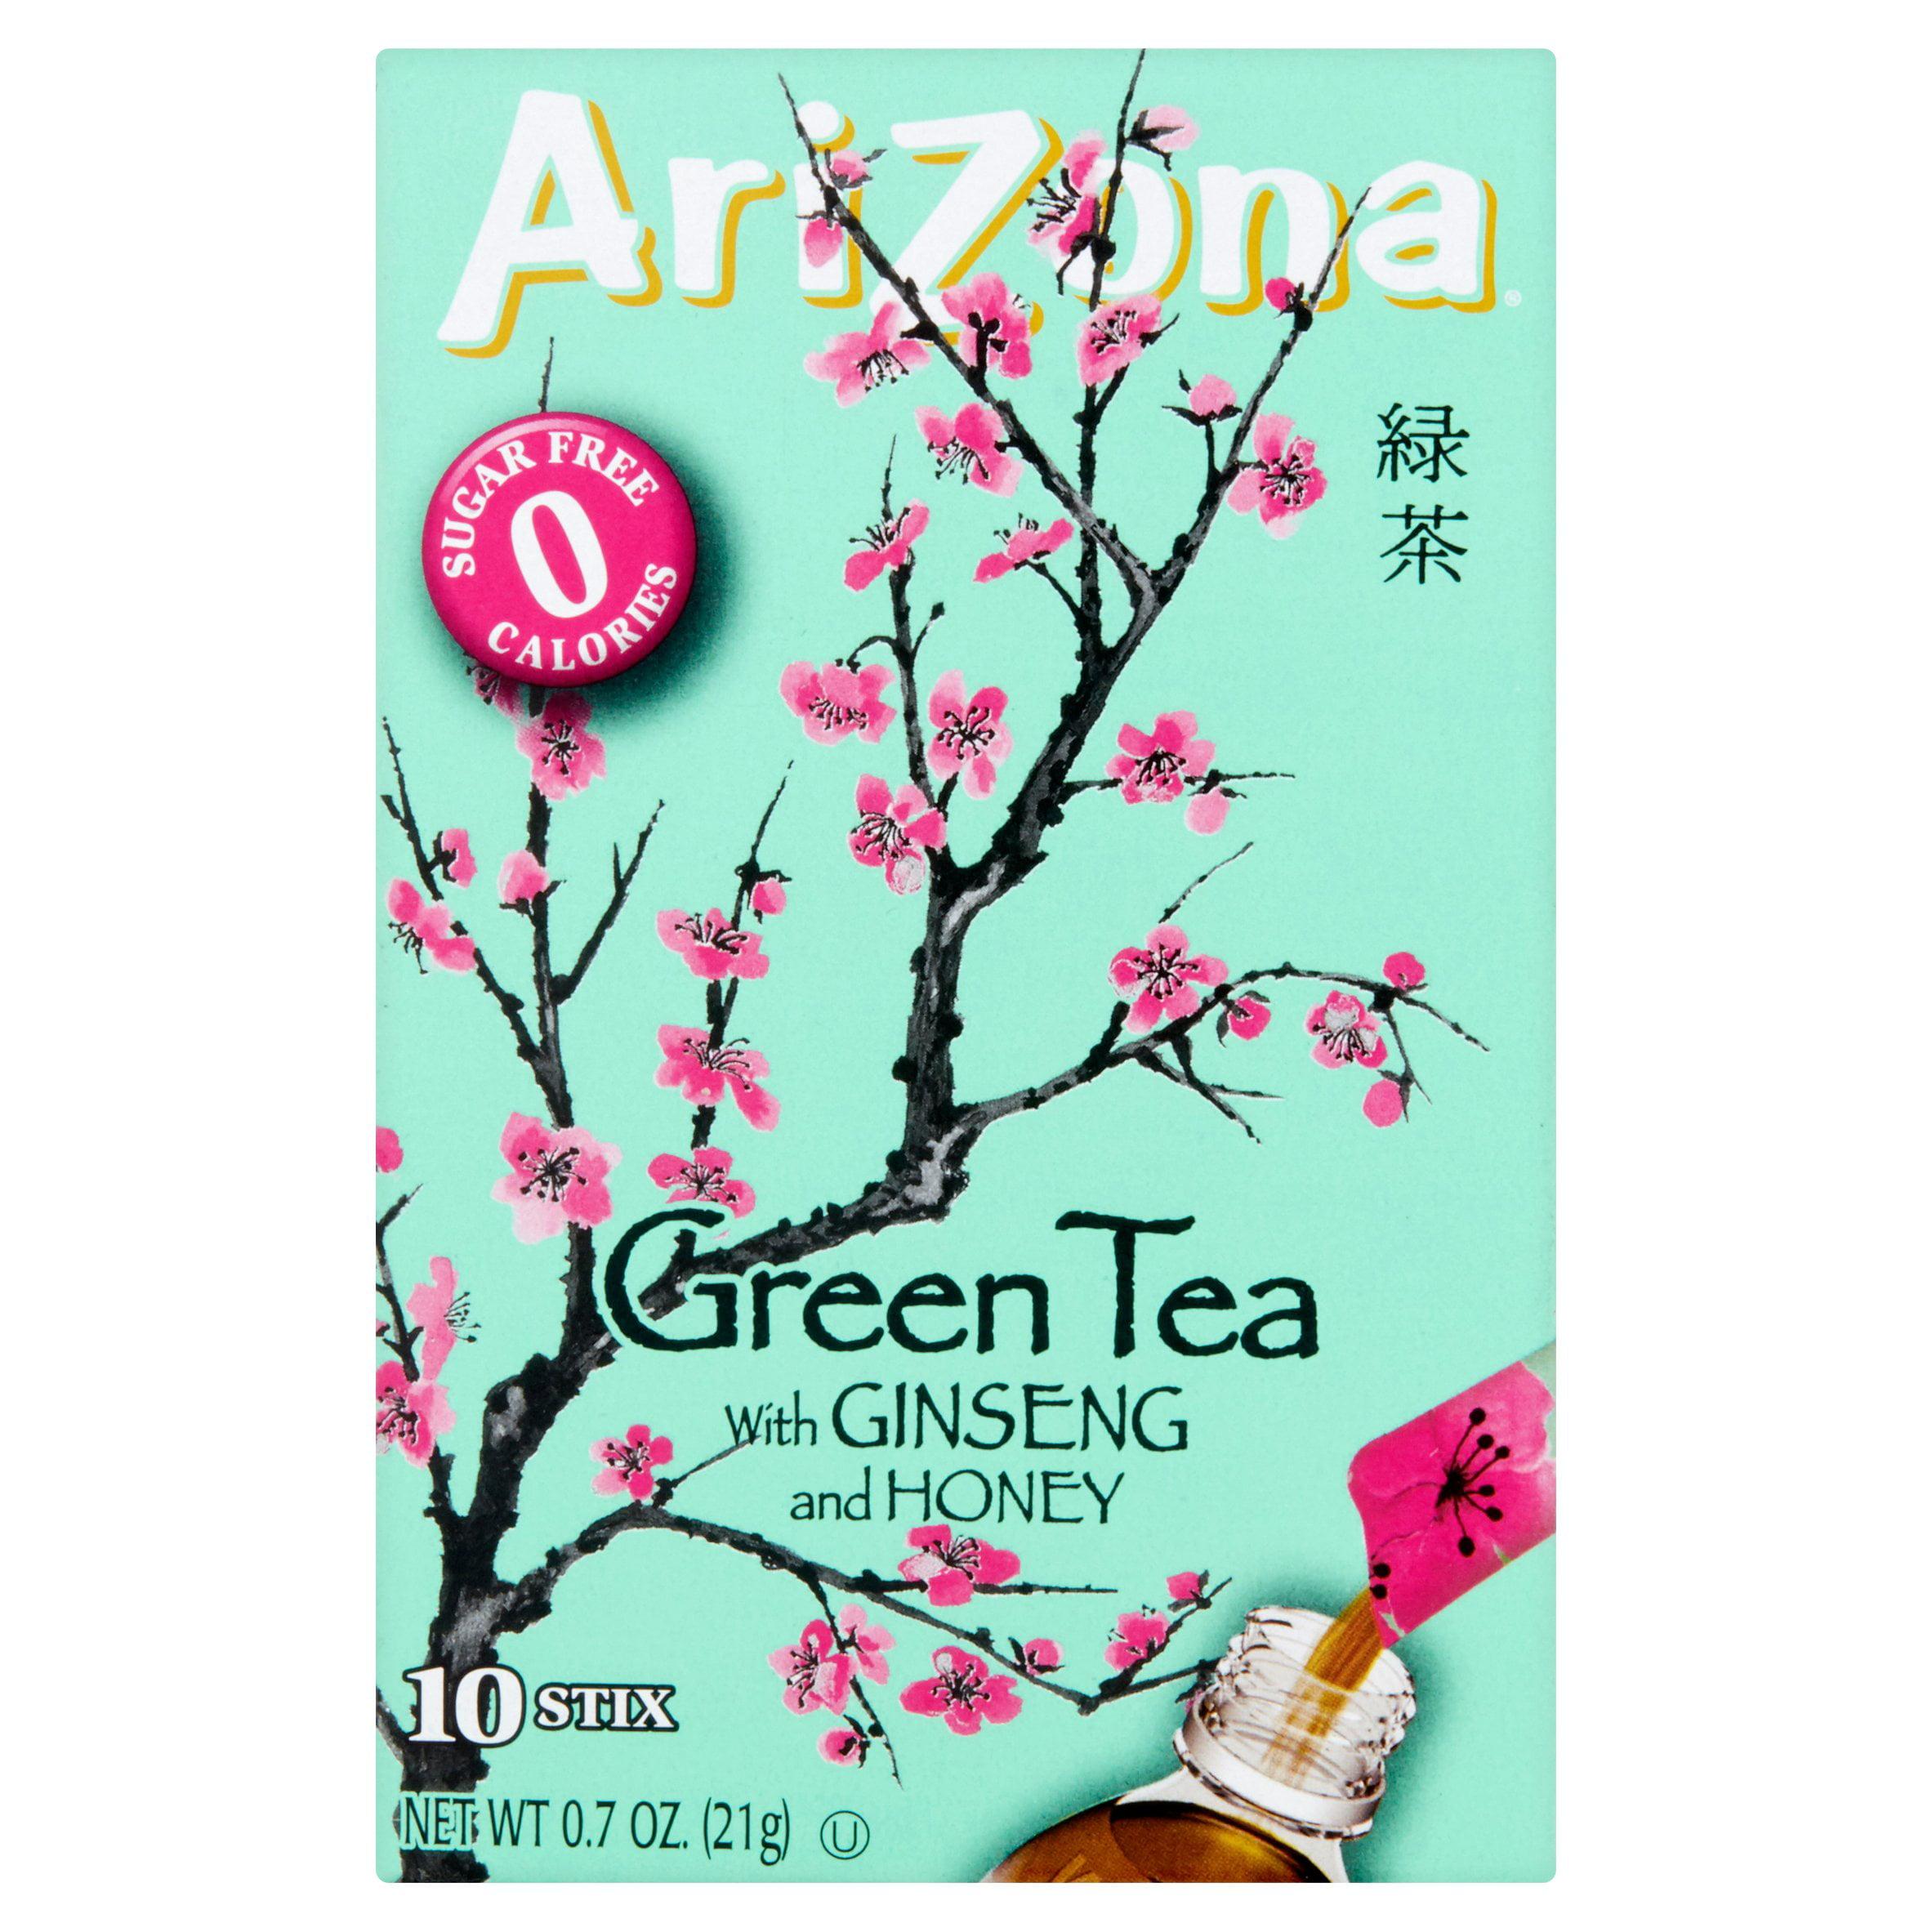 AriZona Green Tea with Ginseng and Honey Iced Tea Stix, Sugar Free, 10 count by Arizona Beverages USA LLC